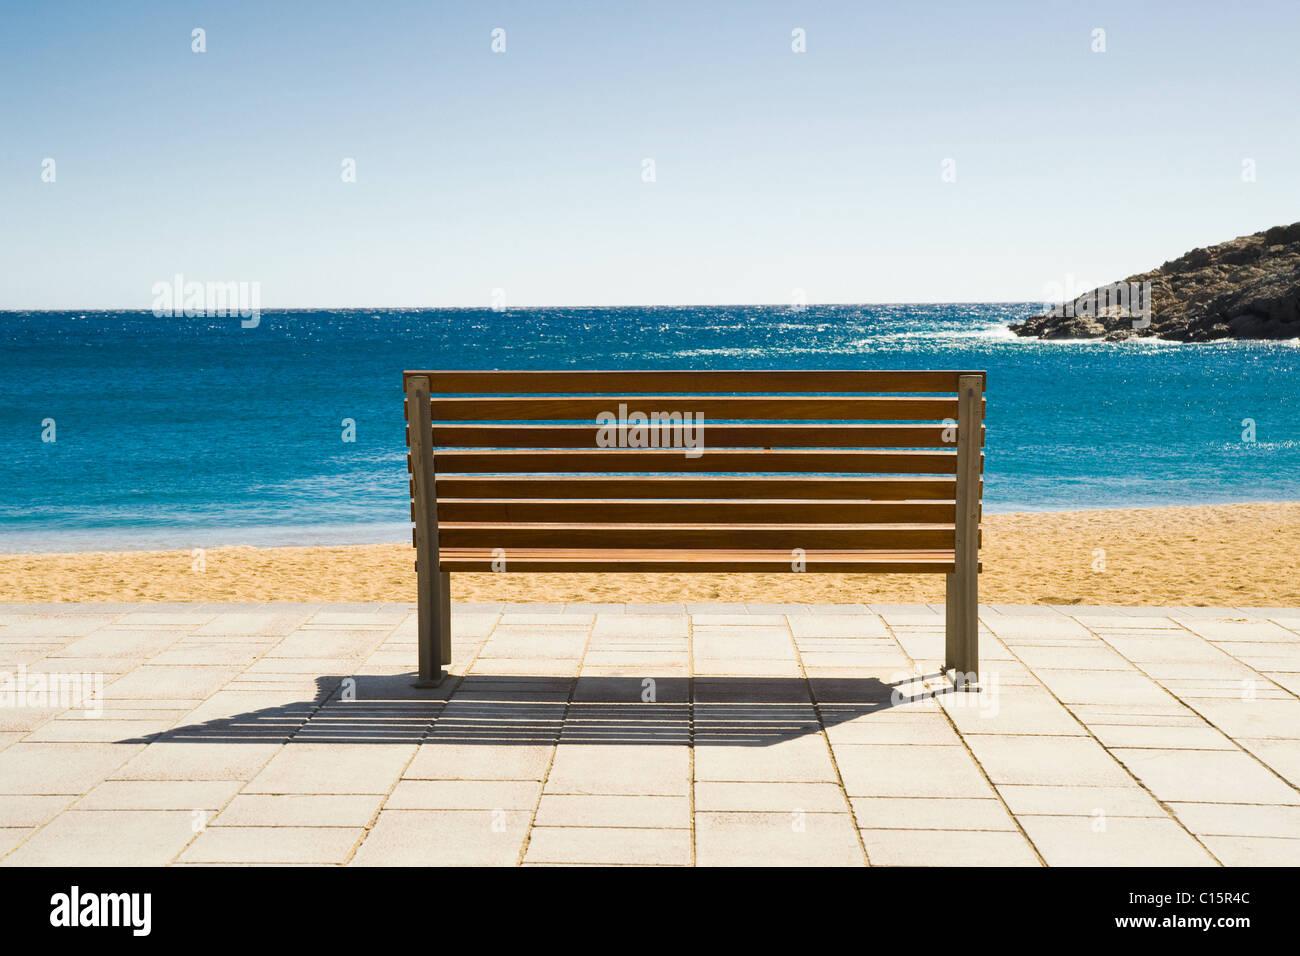 Empty Bench, Tamariu, Costa Brava, Catalonia, Spain - Stock Image